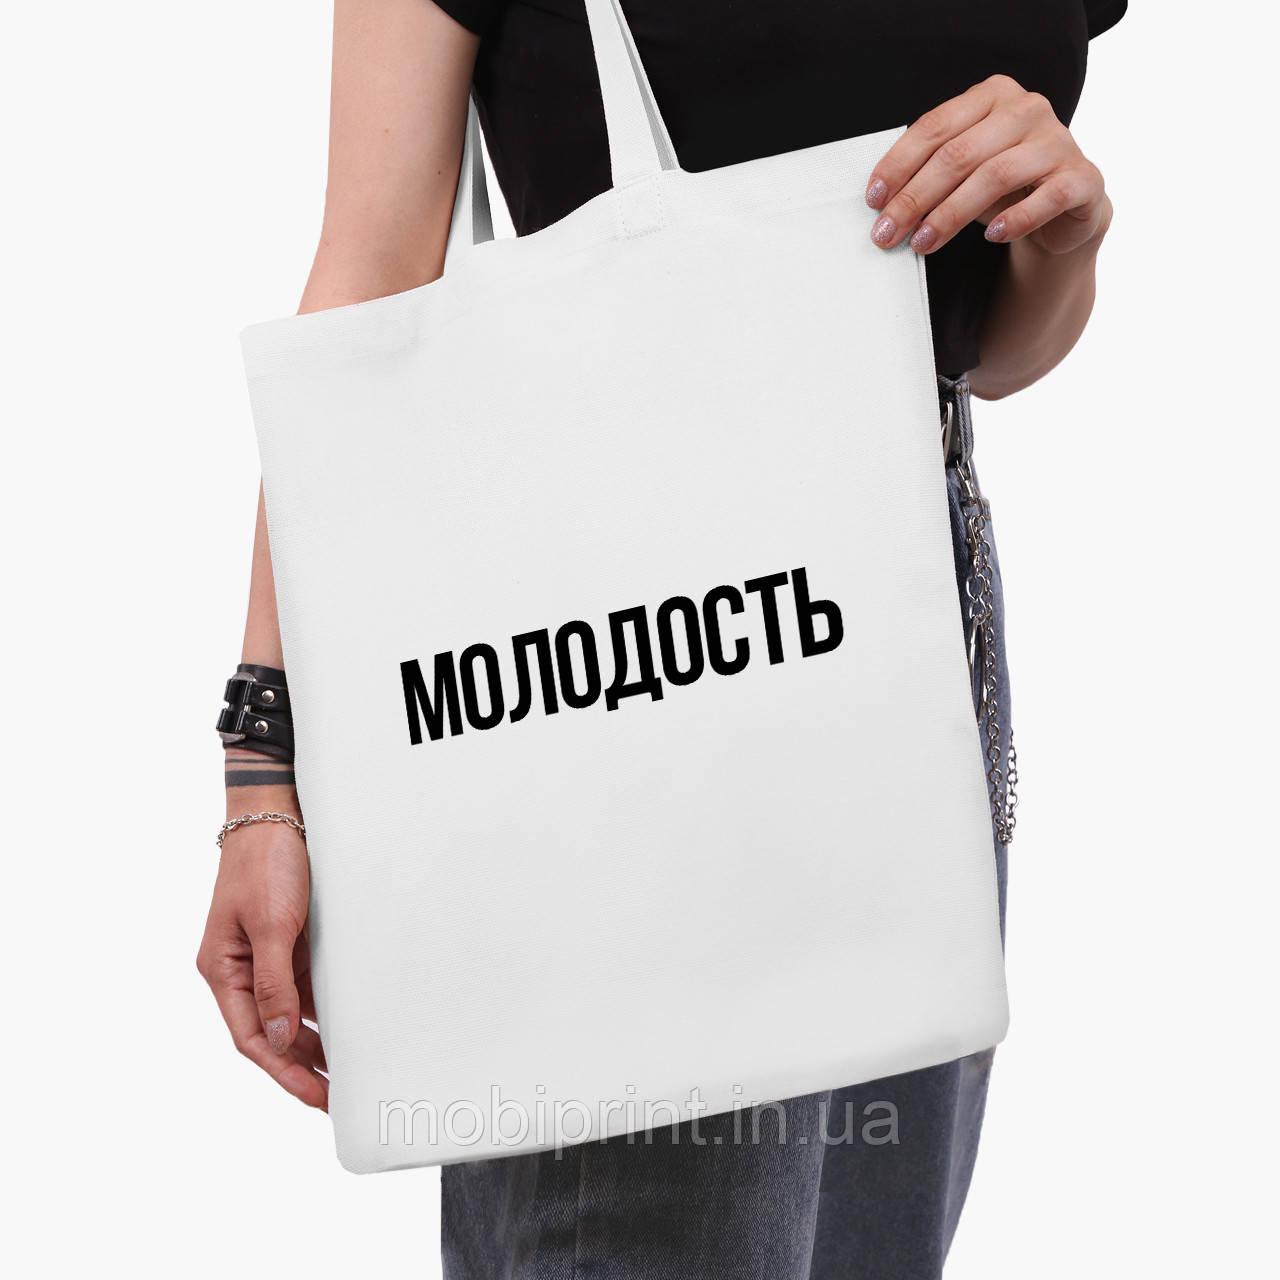 Эко сумка шоппер белая Молодость (Youth) (9227-1281-3)  41*35 см